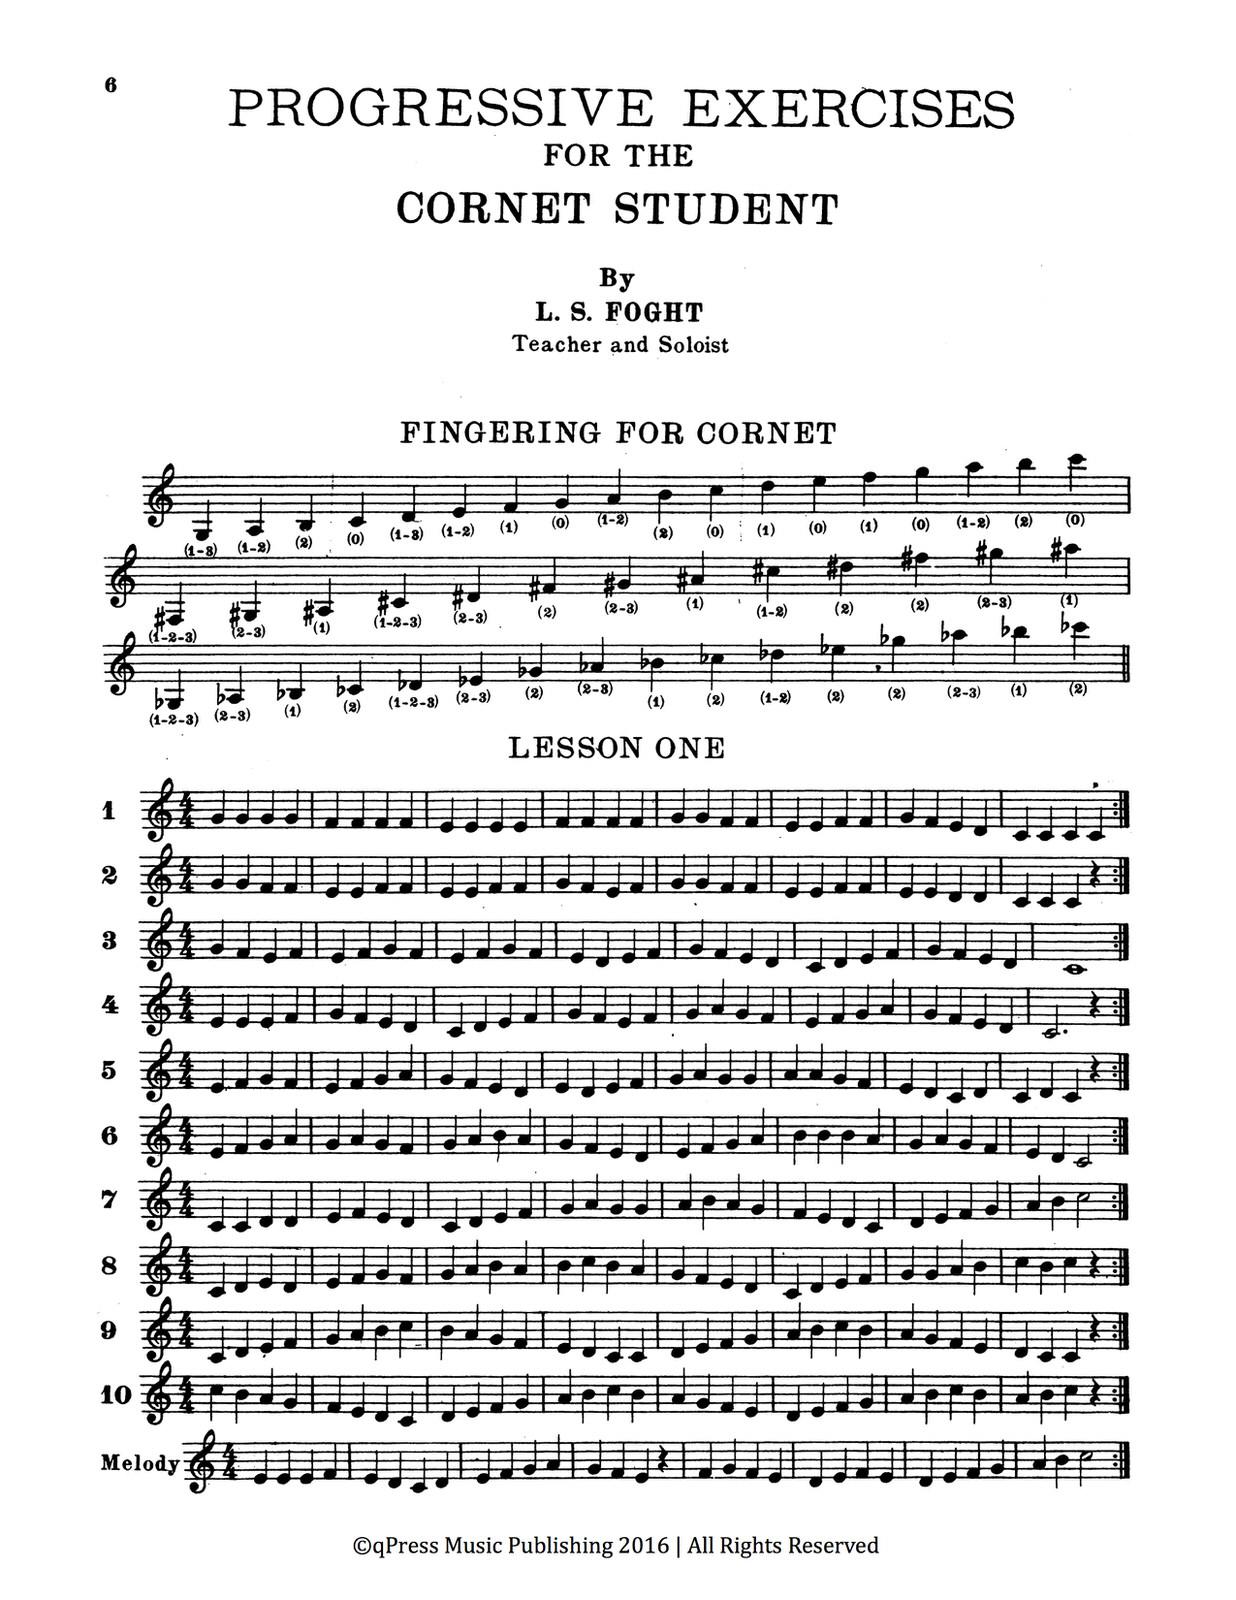 Foght, L.S. Progressive Exercises for the Cornet Student 2